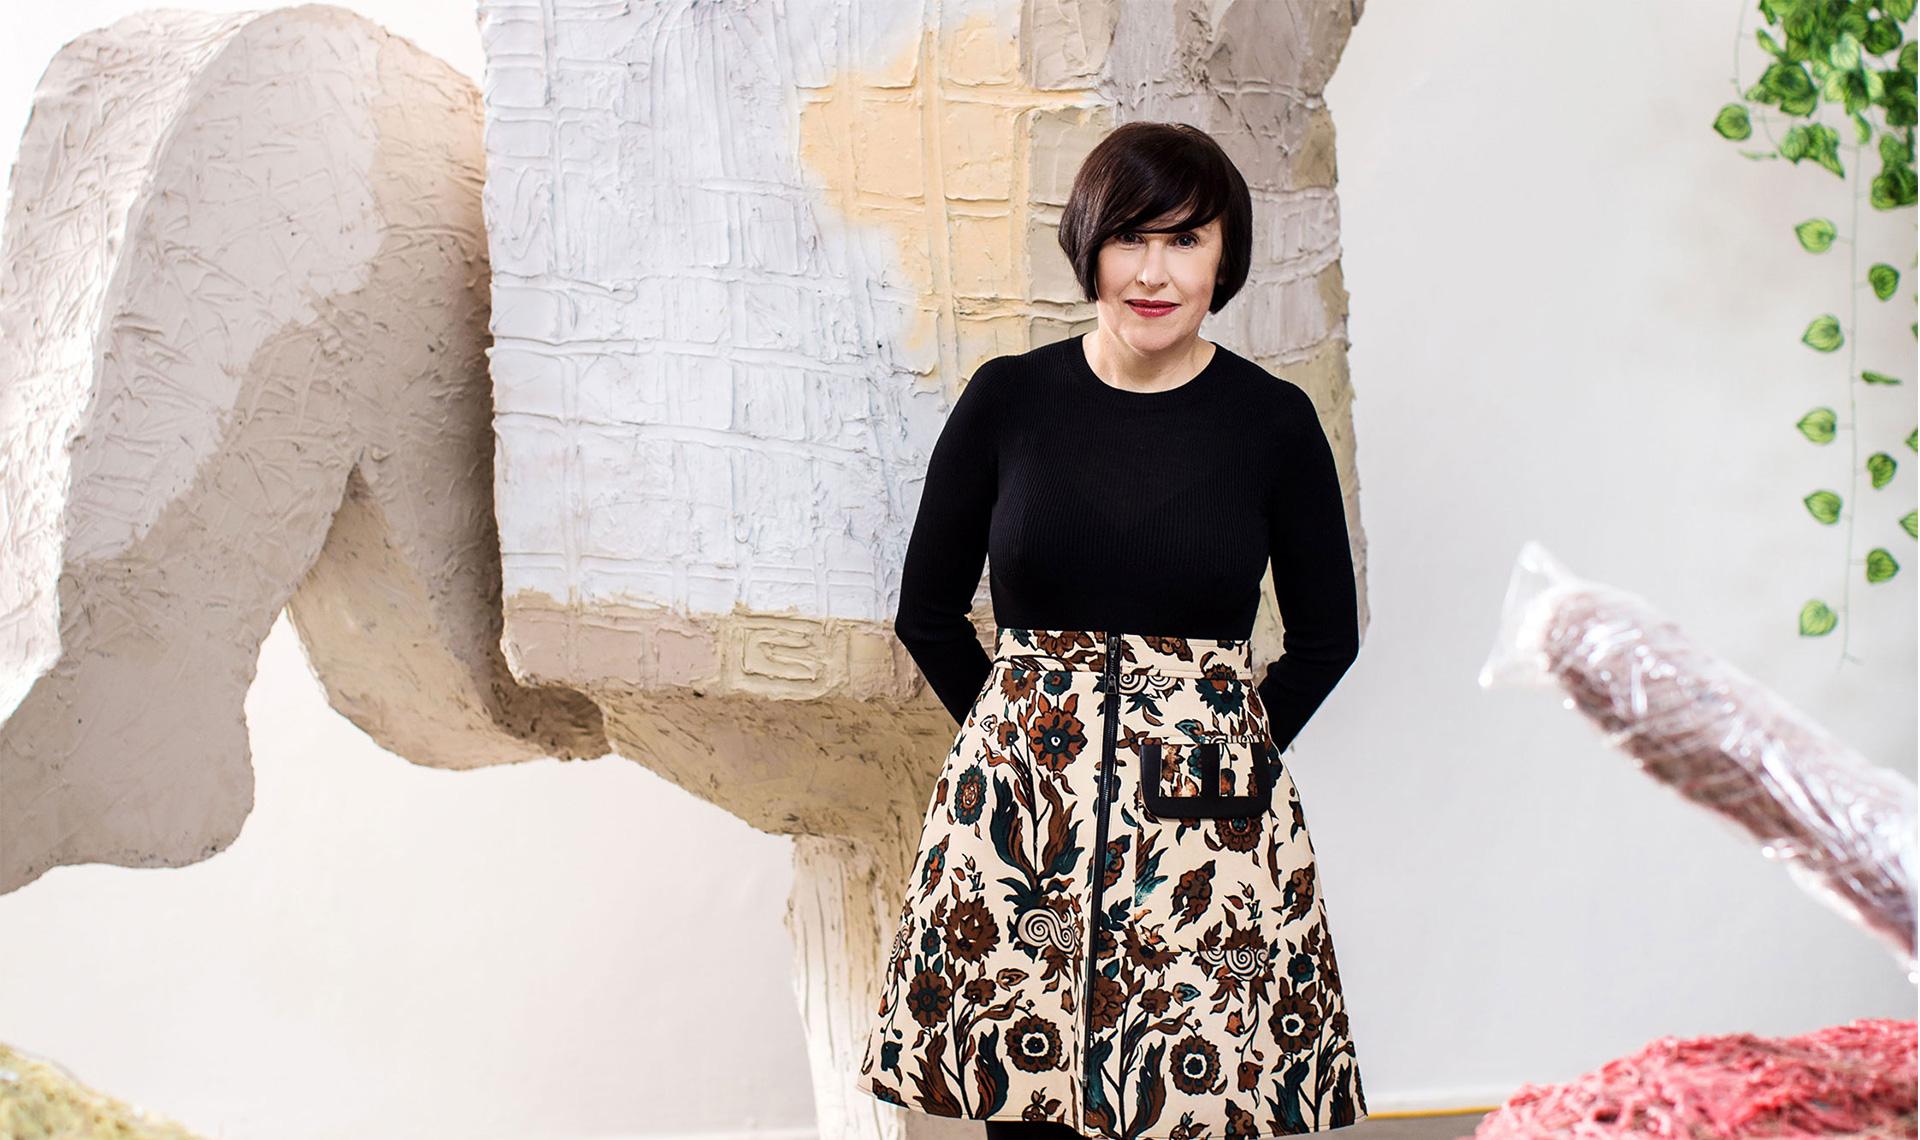 Элис Роусторн: о дизайне как антивирусе